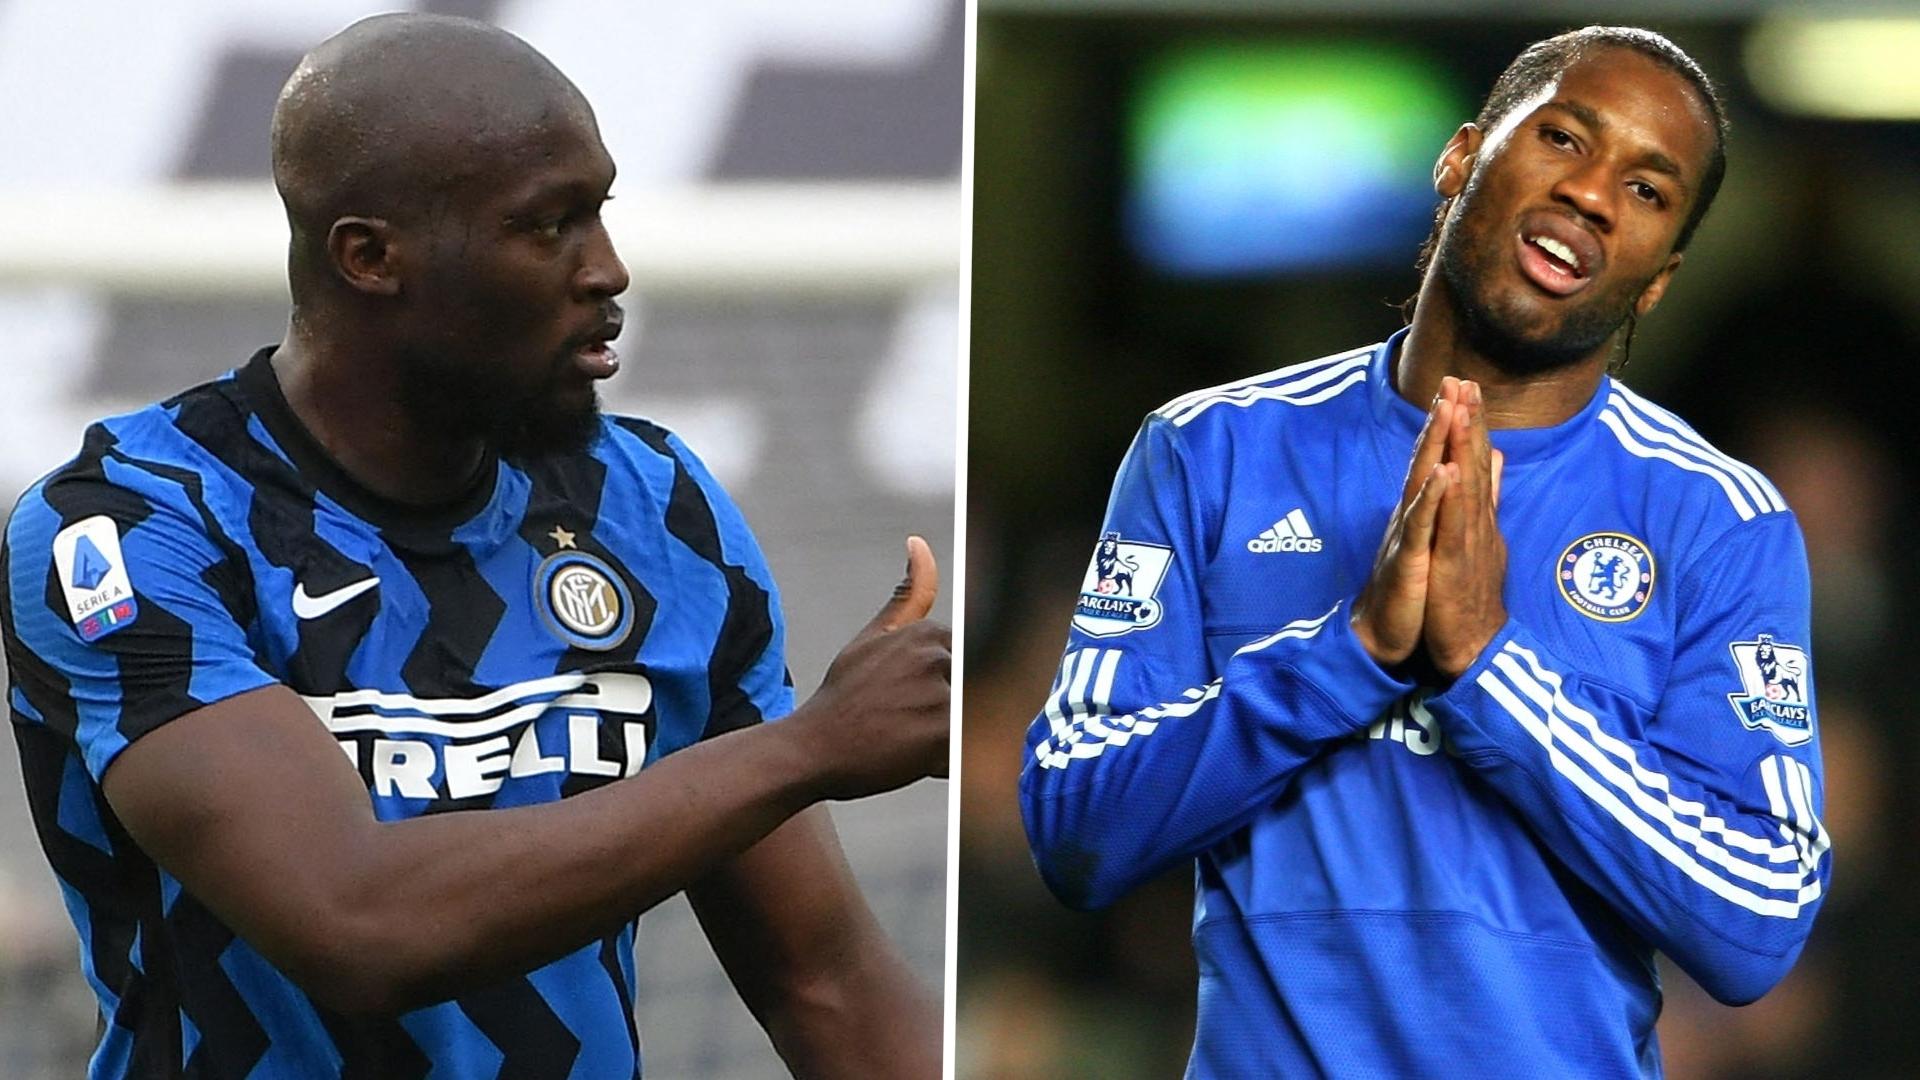 Lukaku must win trophies with Chelsea to warrant Drogba comparisons – Olorundare